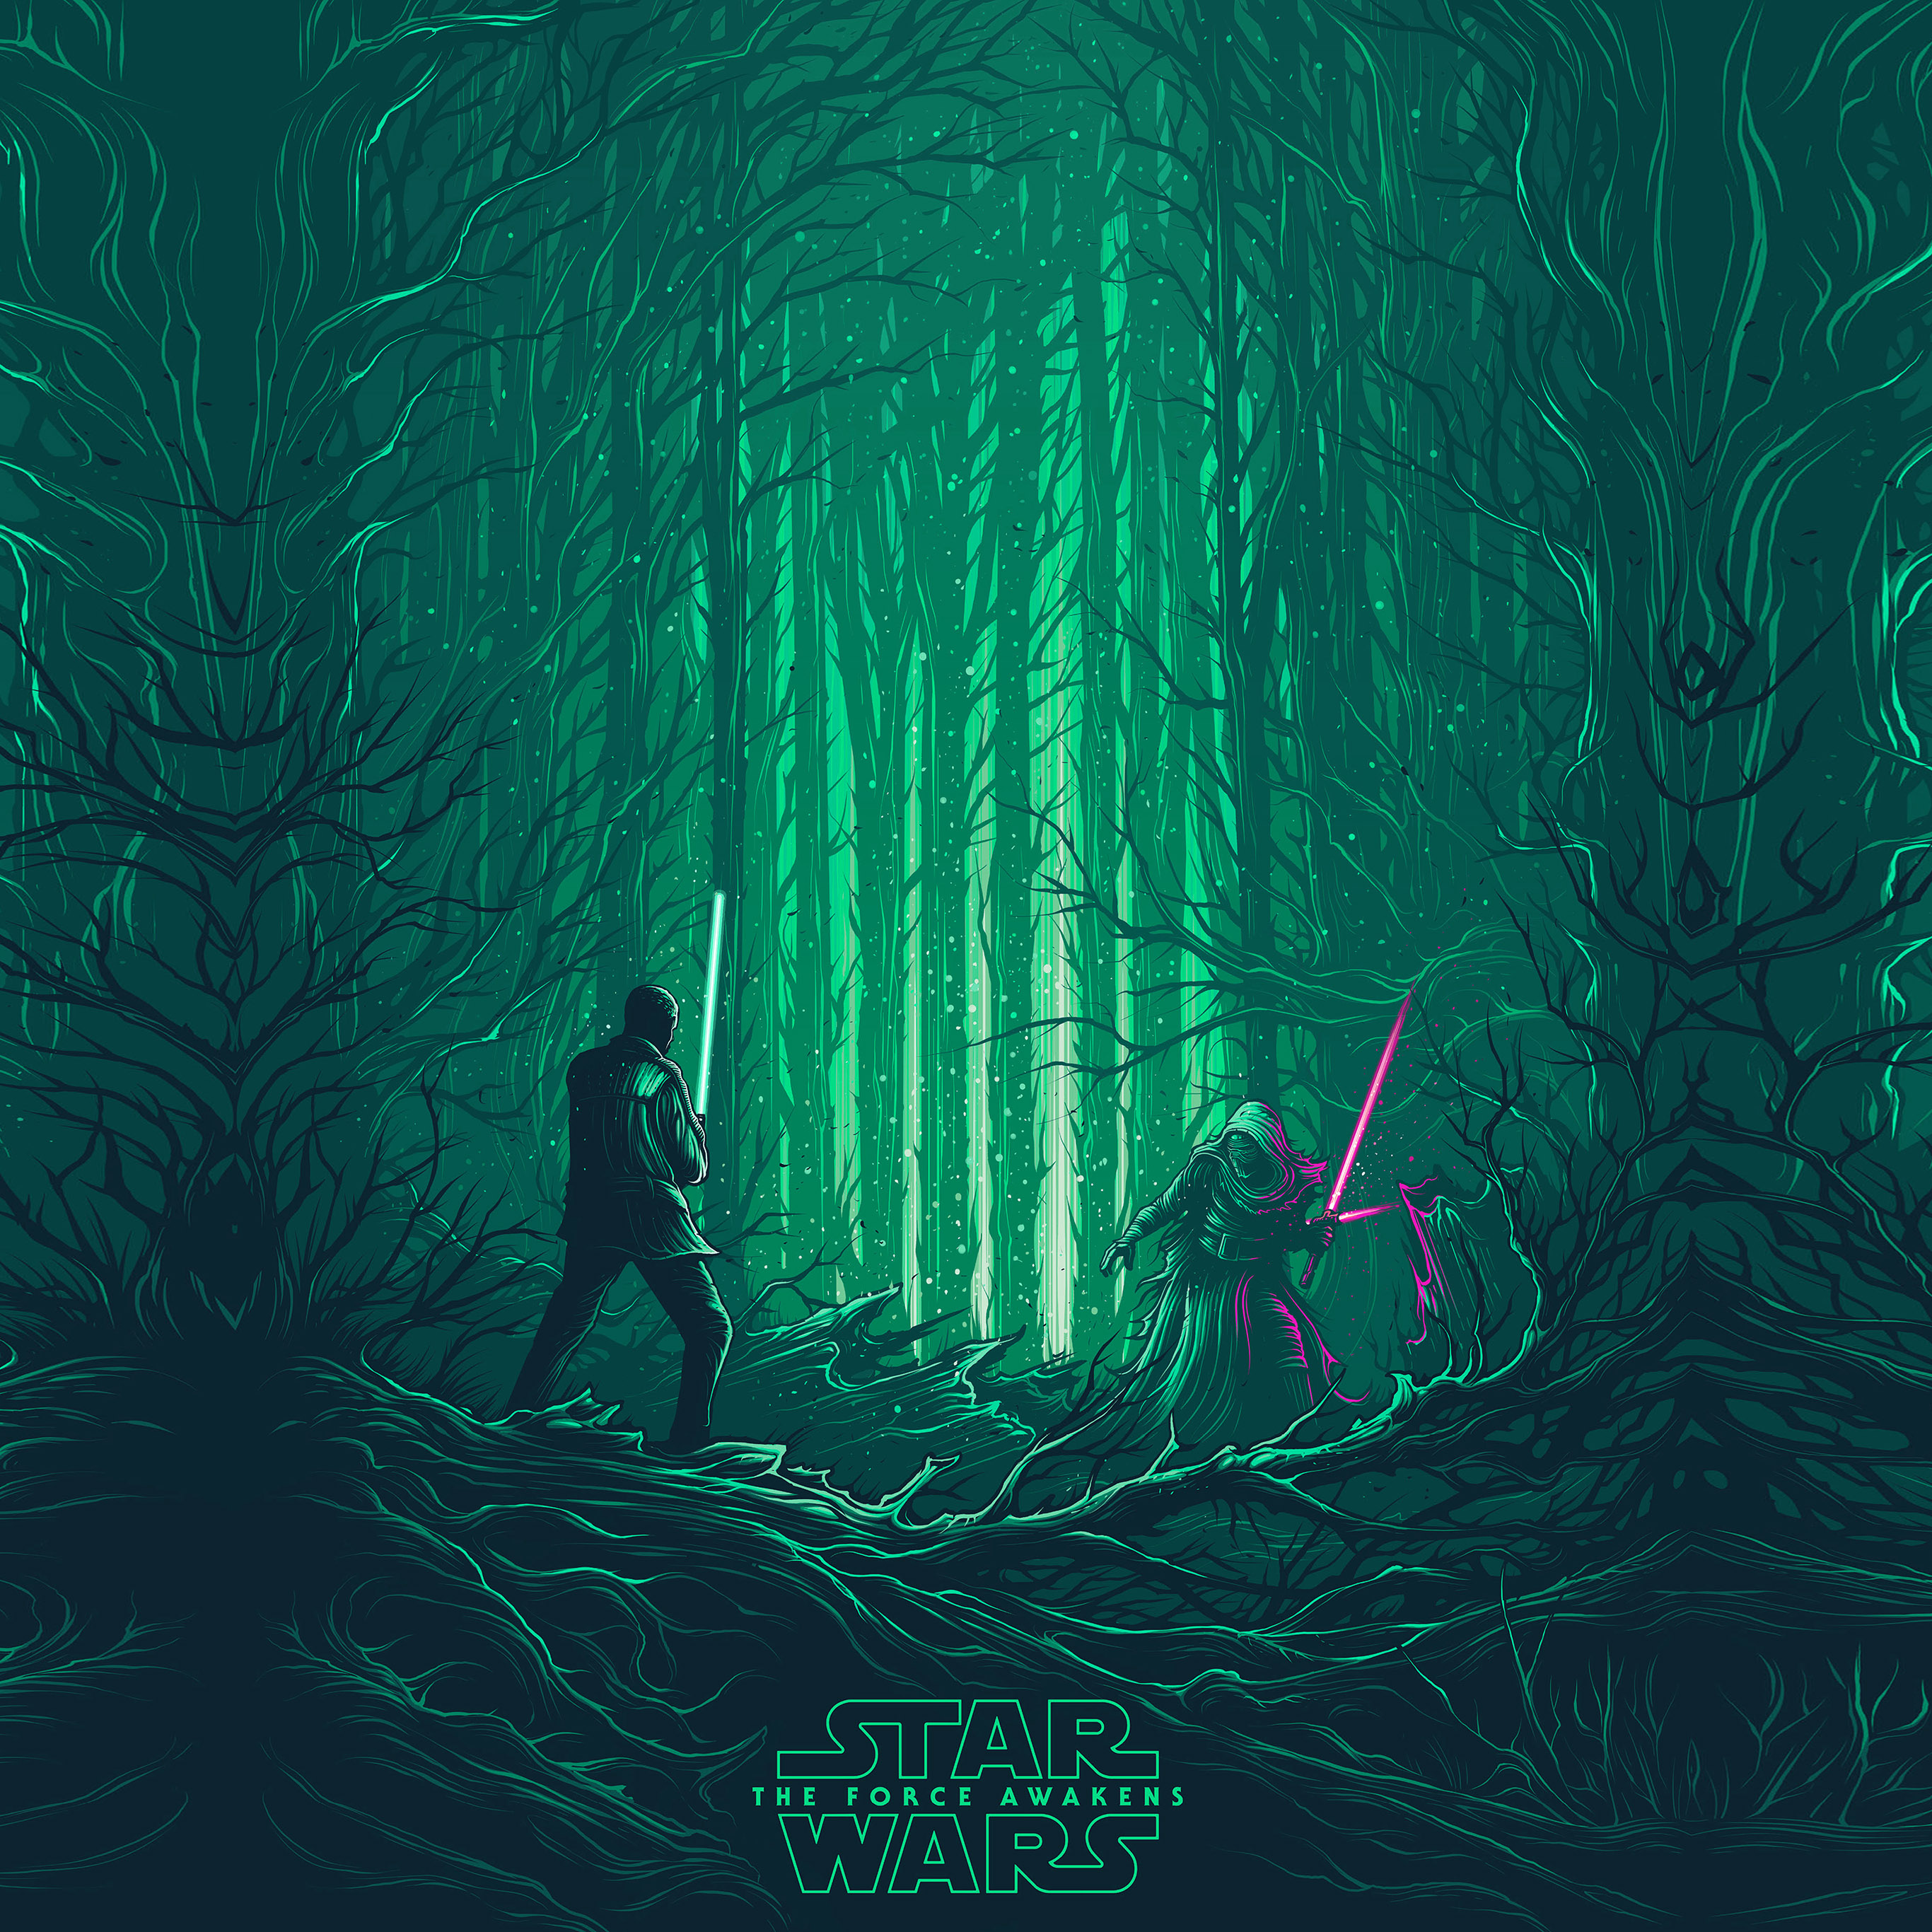 Star Wars Wallpaper Ipad Posted By Sarah Sellers